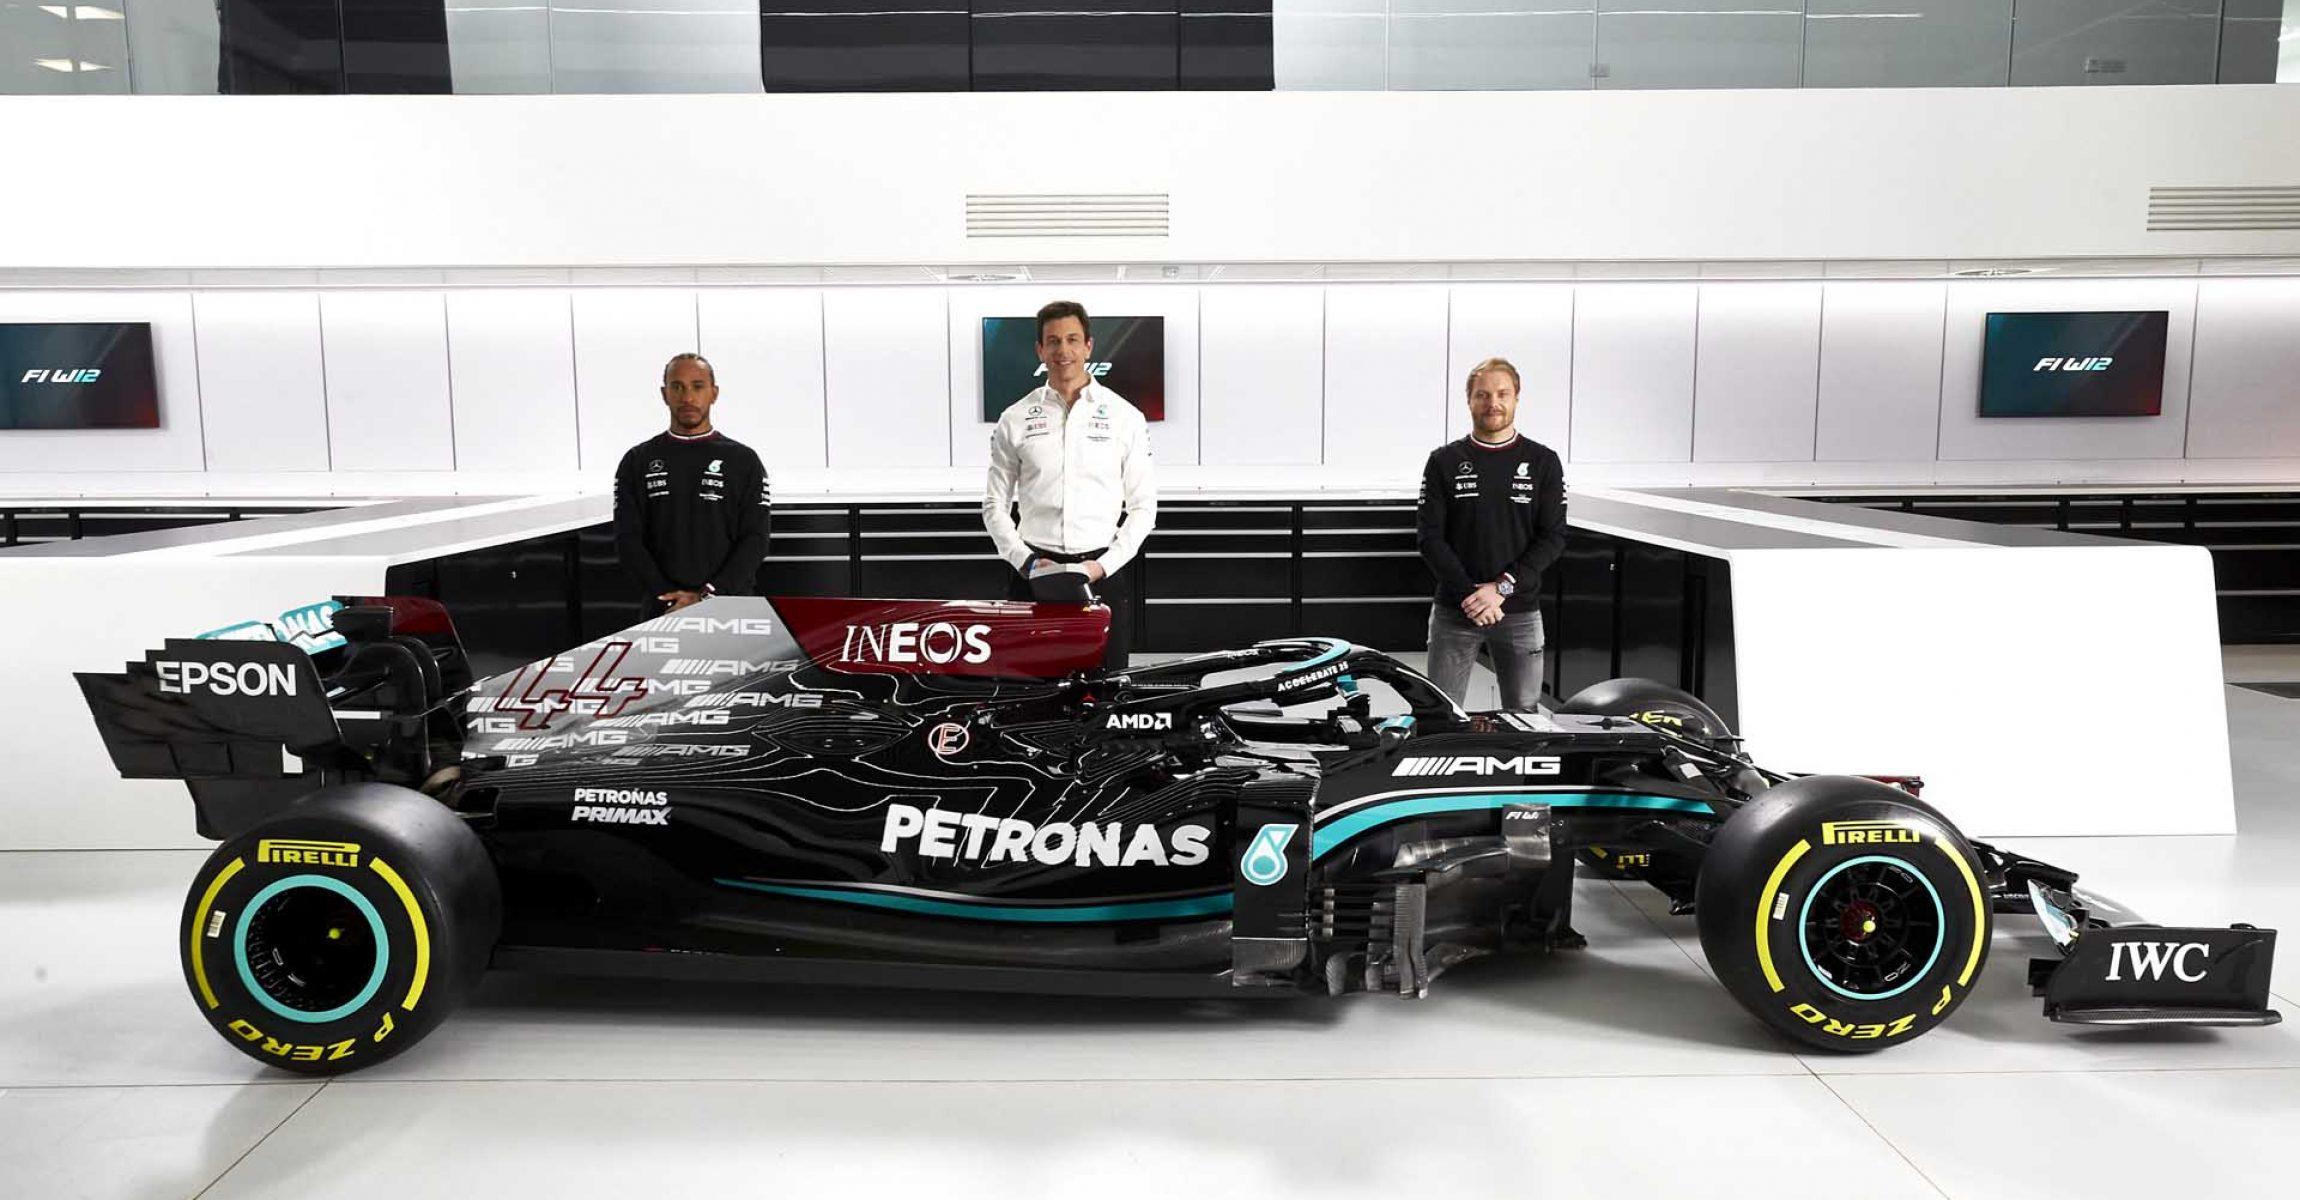 Mercedes-AMG F1 W12 E Performance Launch Lewis Hamilton Toto Wolff Valtteri Bottas Mercedes W12